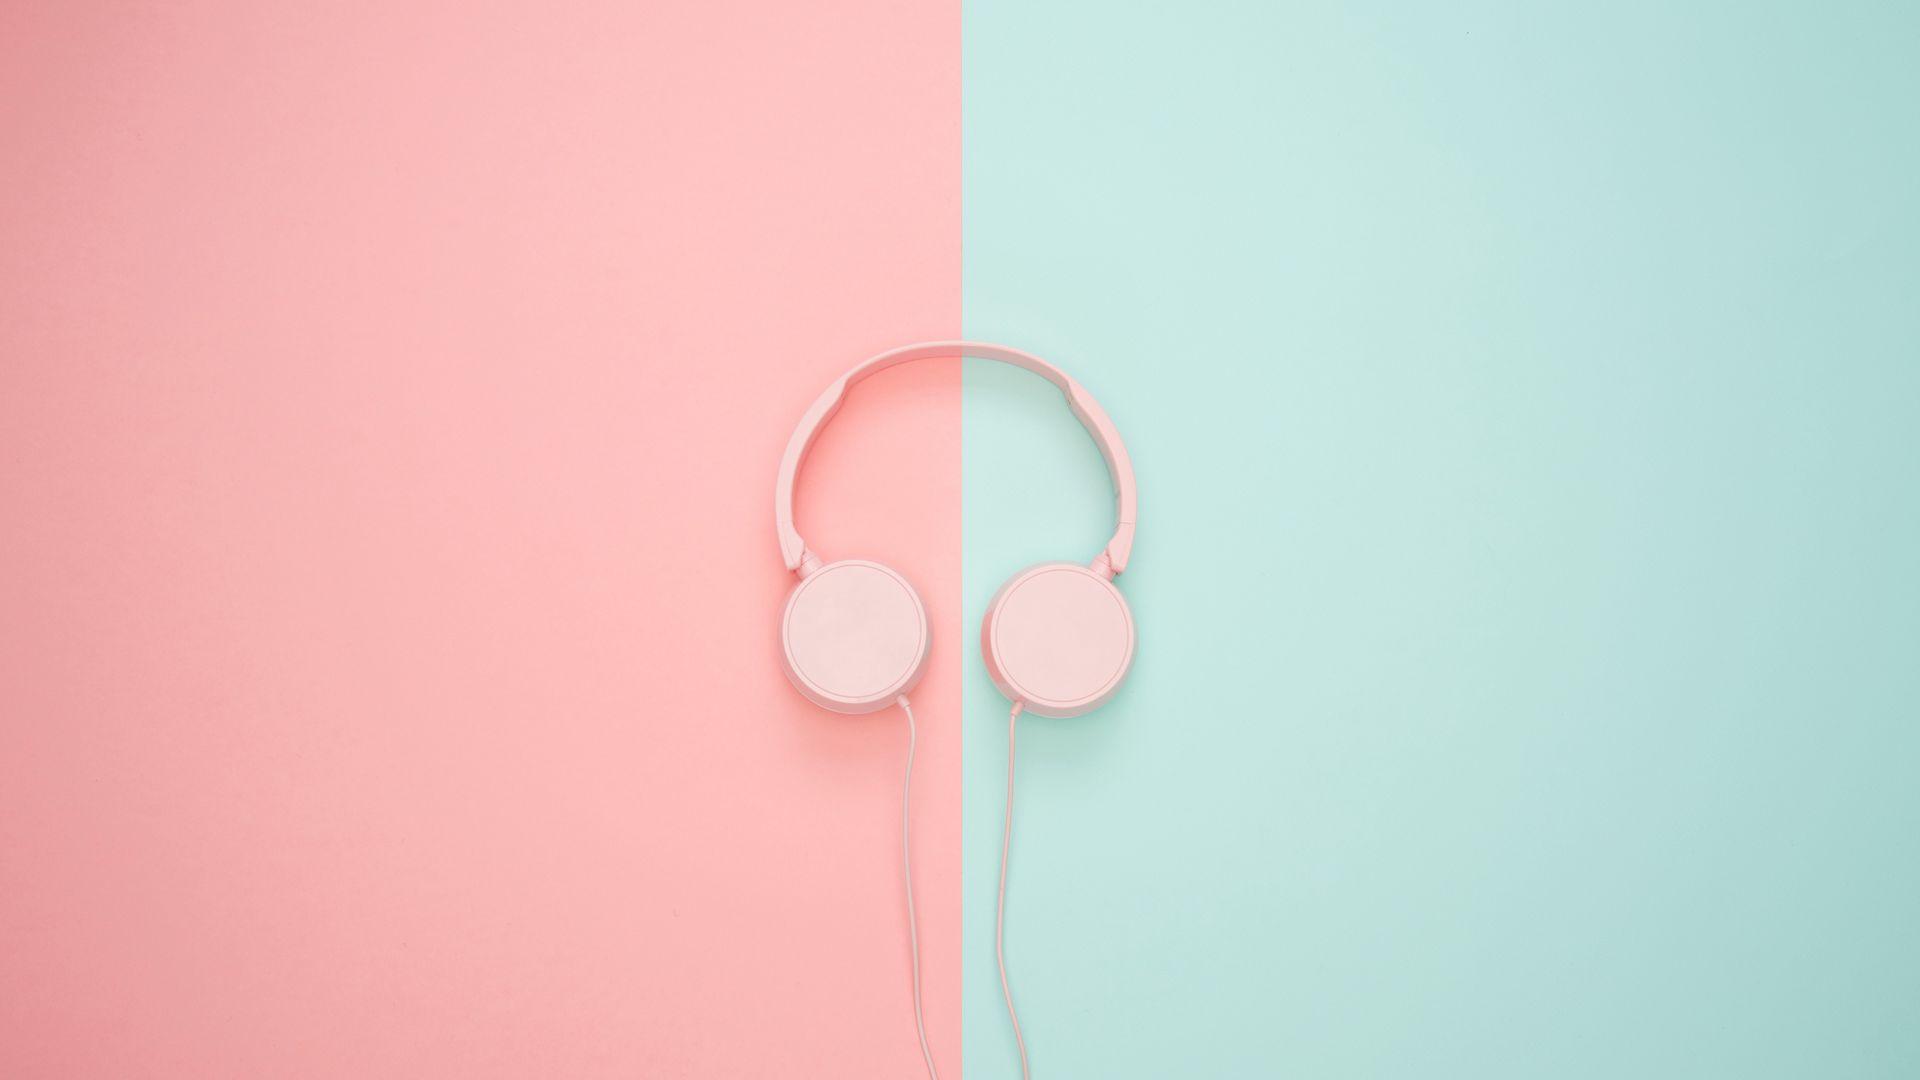 1920x1080 Wallpaper headphones, minimalism, pink, pastel